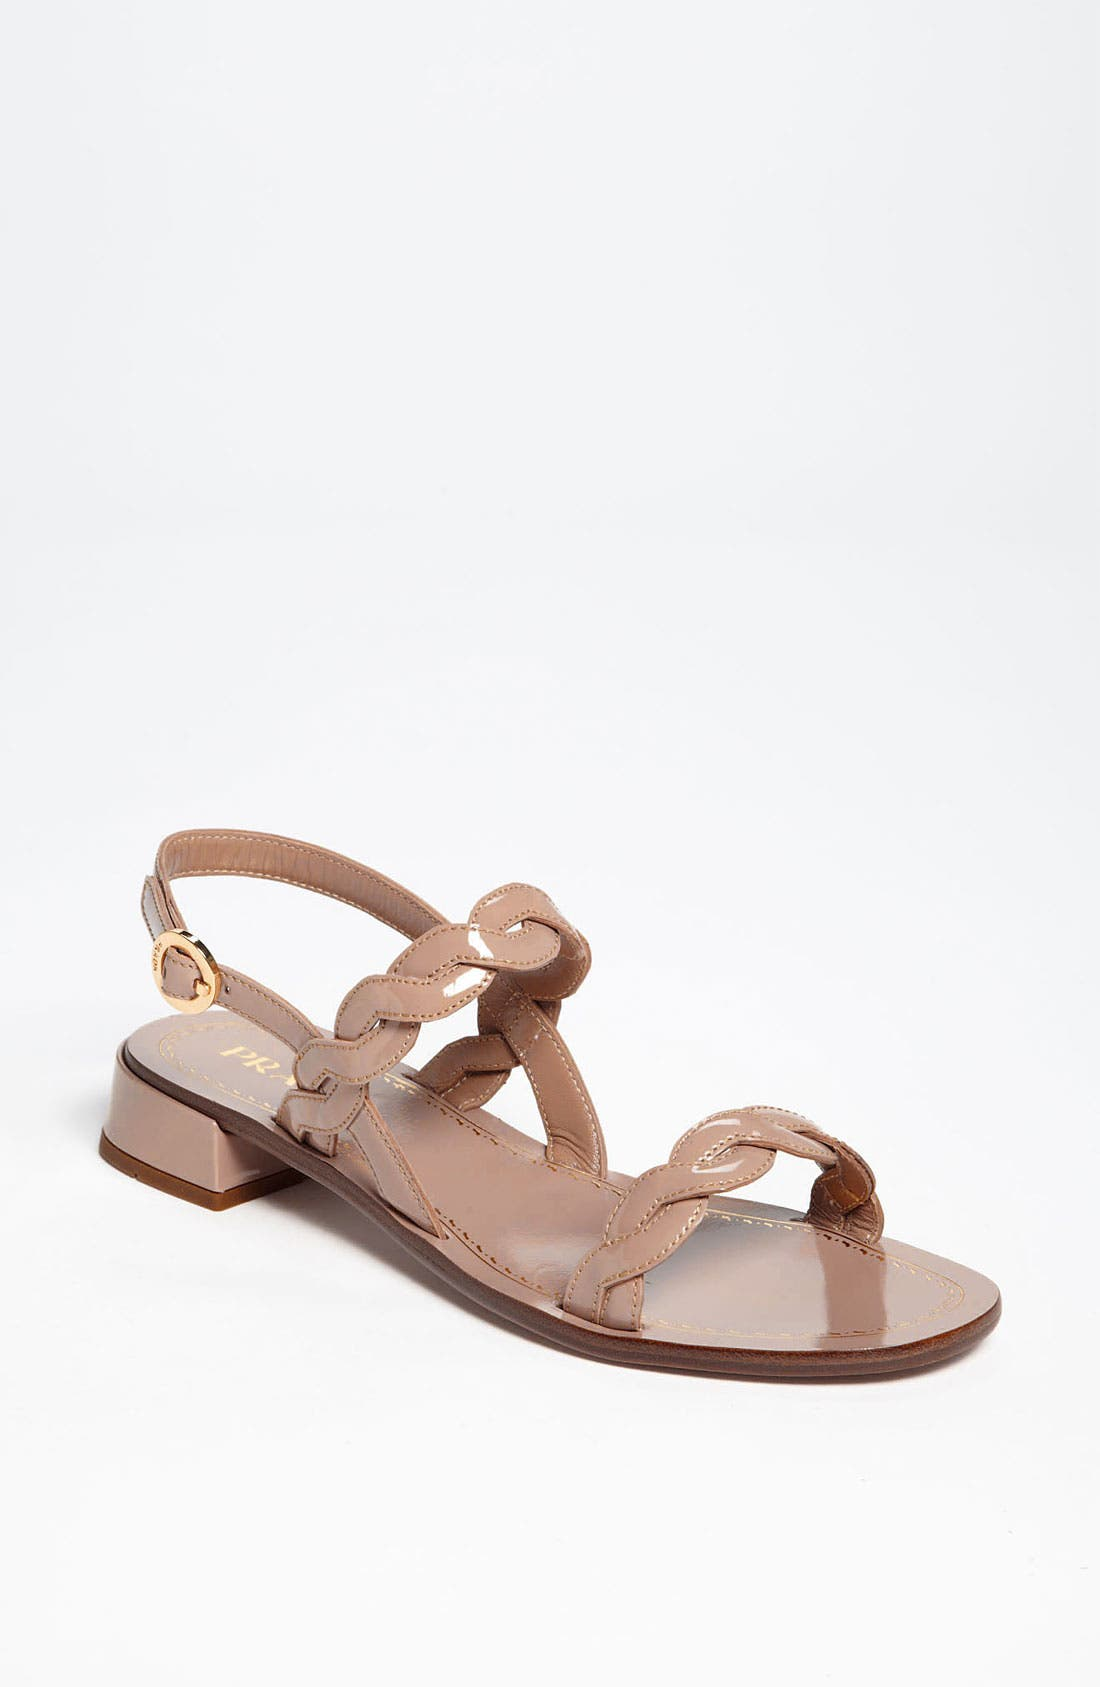 Alternate Image 1 Selected - Prada Braided Two Strap Sandal